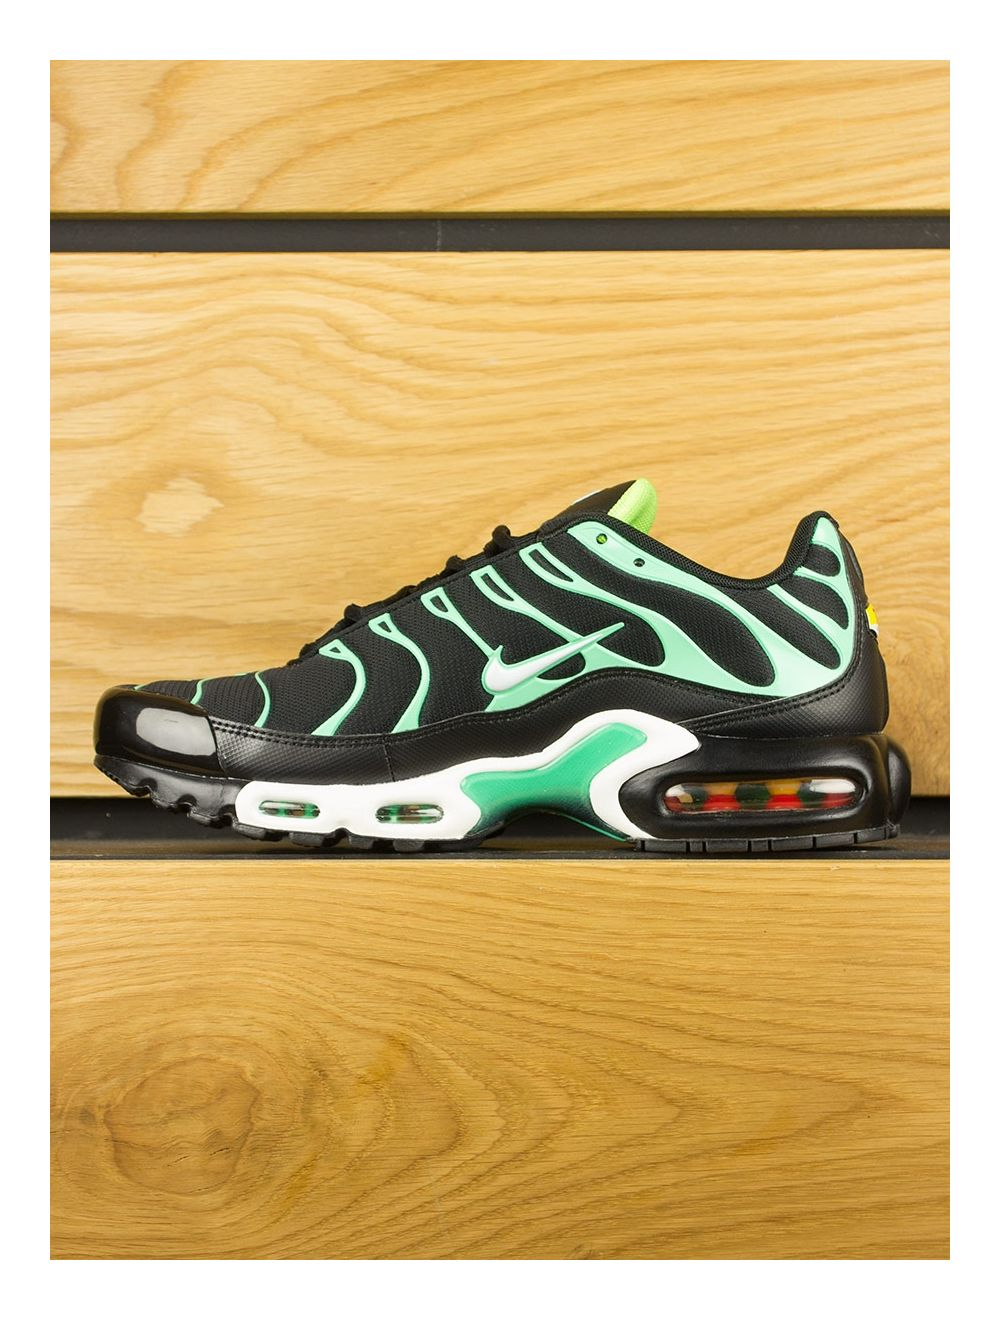 détaillant en ligne d279b 9fb7c Nike Air Max Plus (TN) - Black White Electric Green